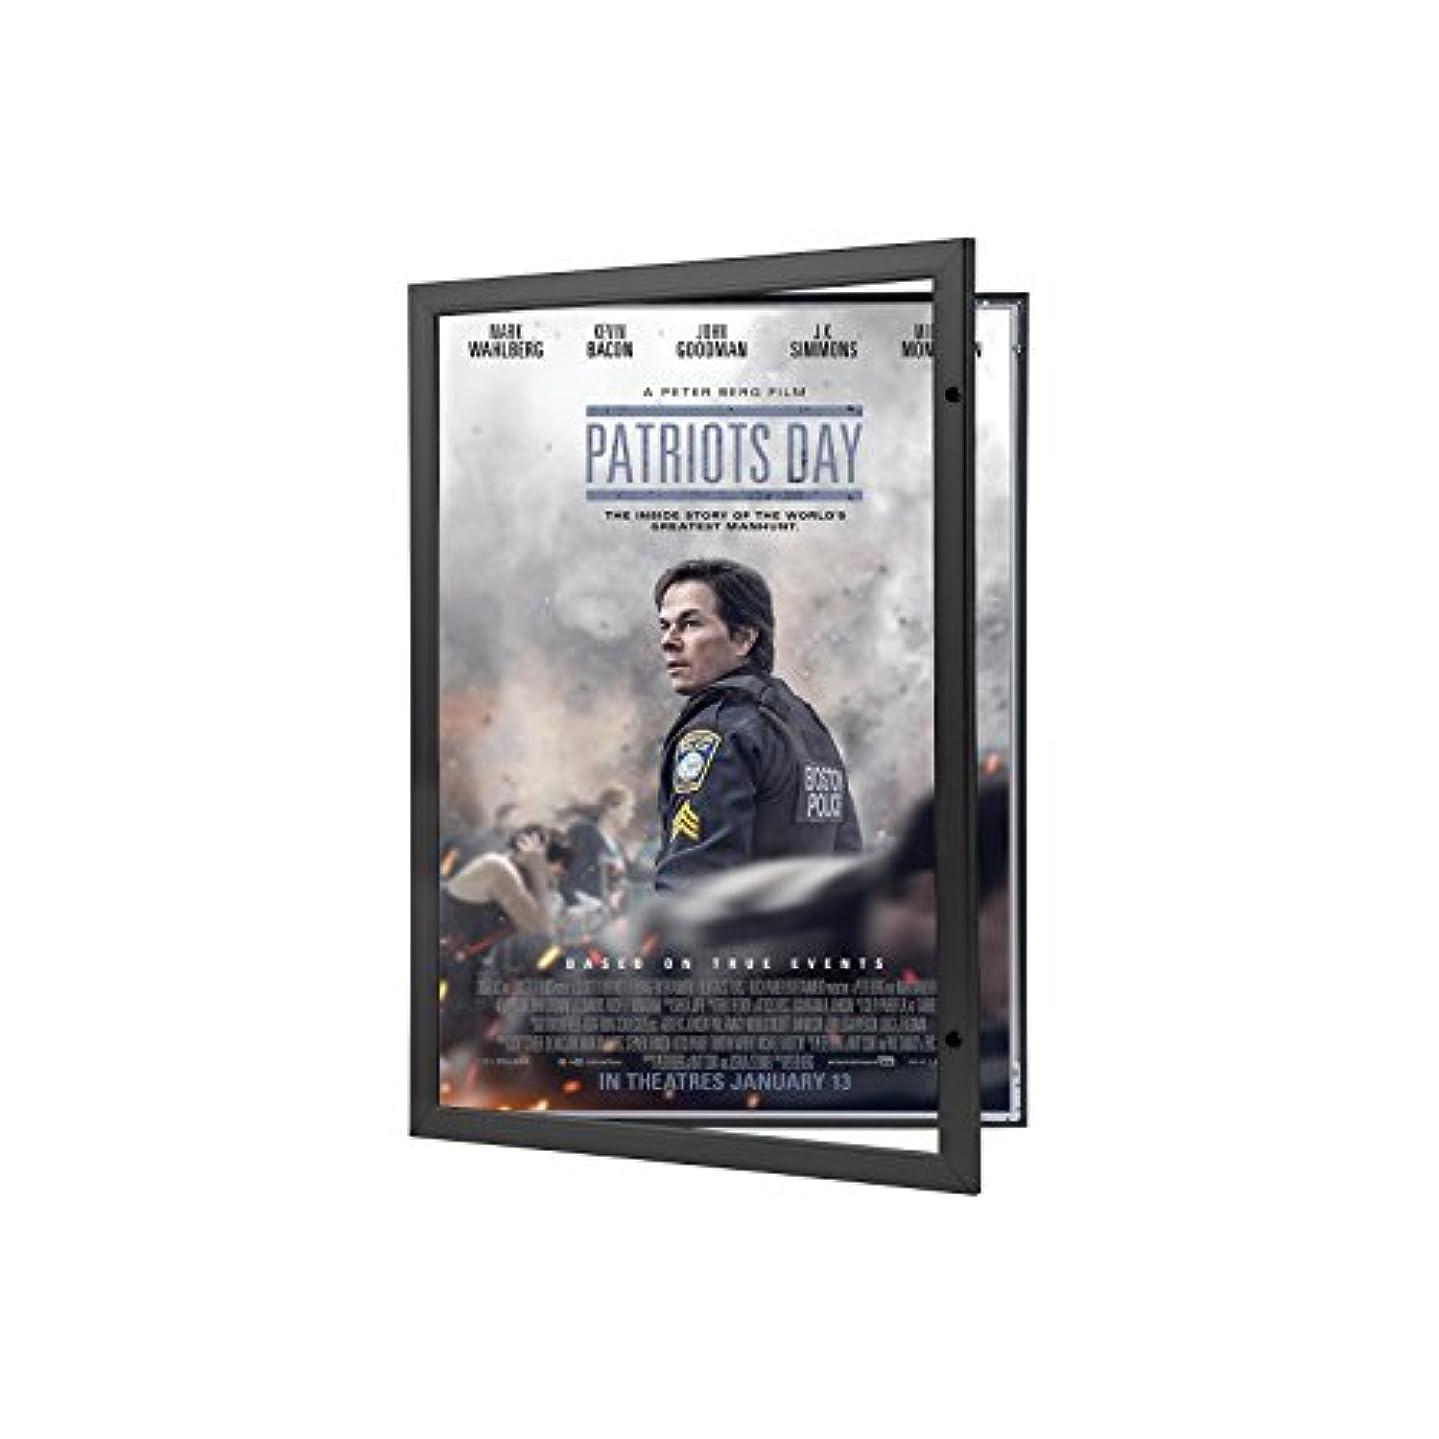 Movie Poster Case 27x40 Inches, Black SnapeZo 1.8